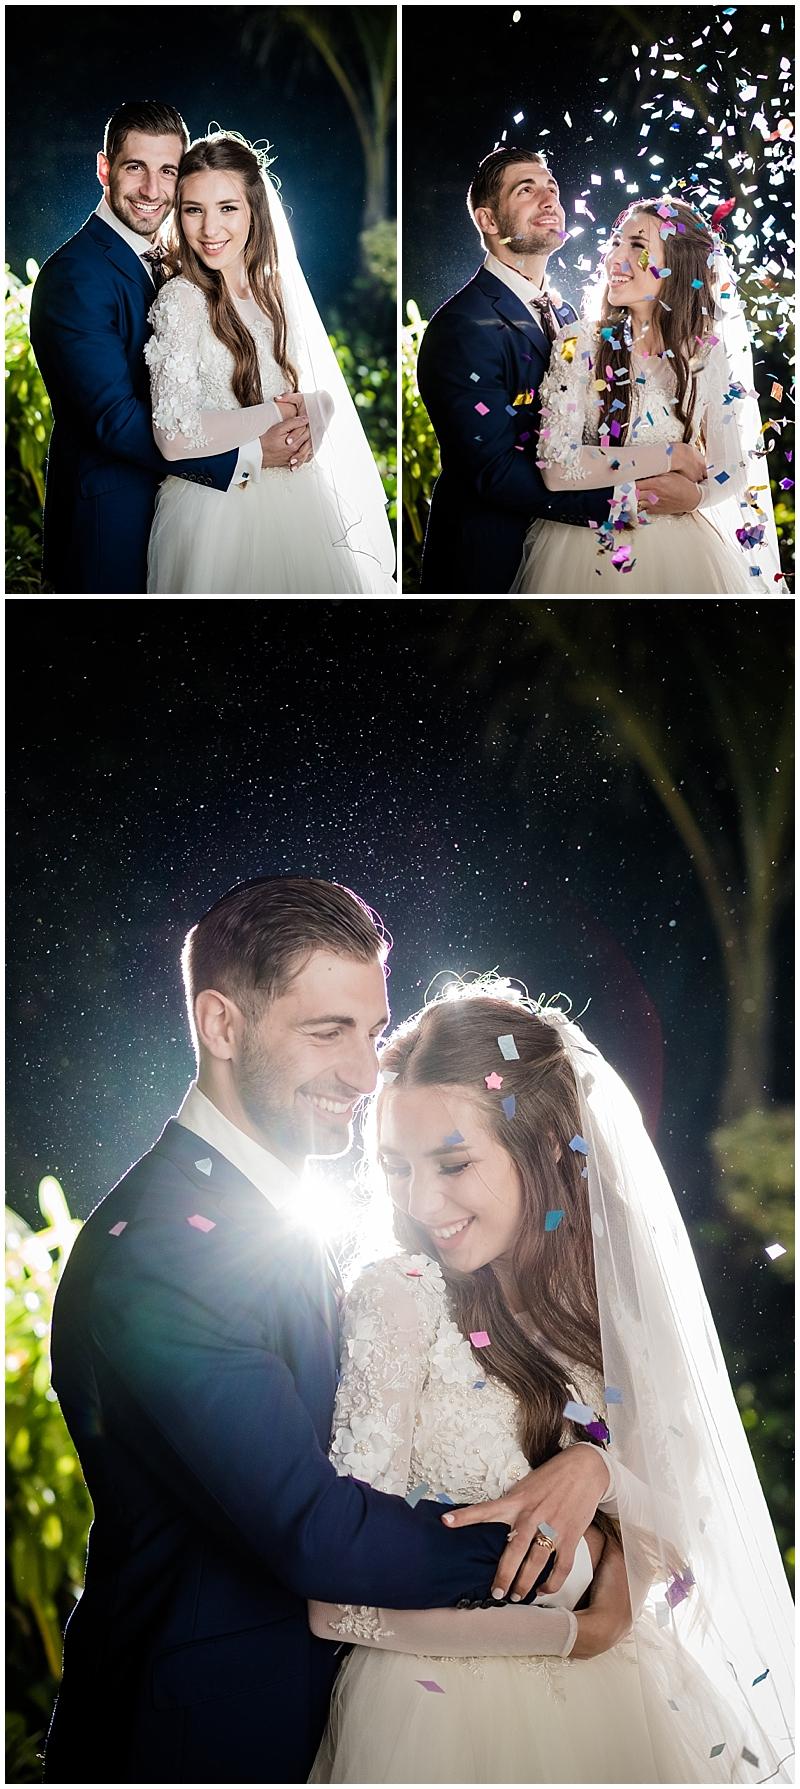 AlexanderSmith-1073_AlexanderSmith Best Wedding Photographer.jpg